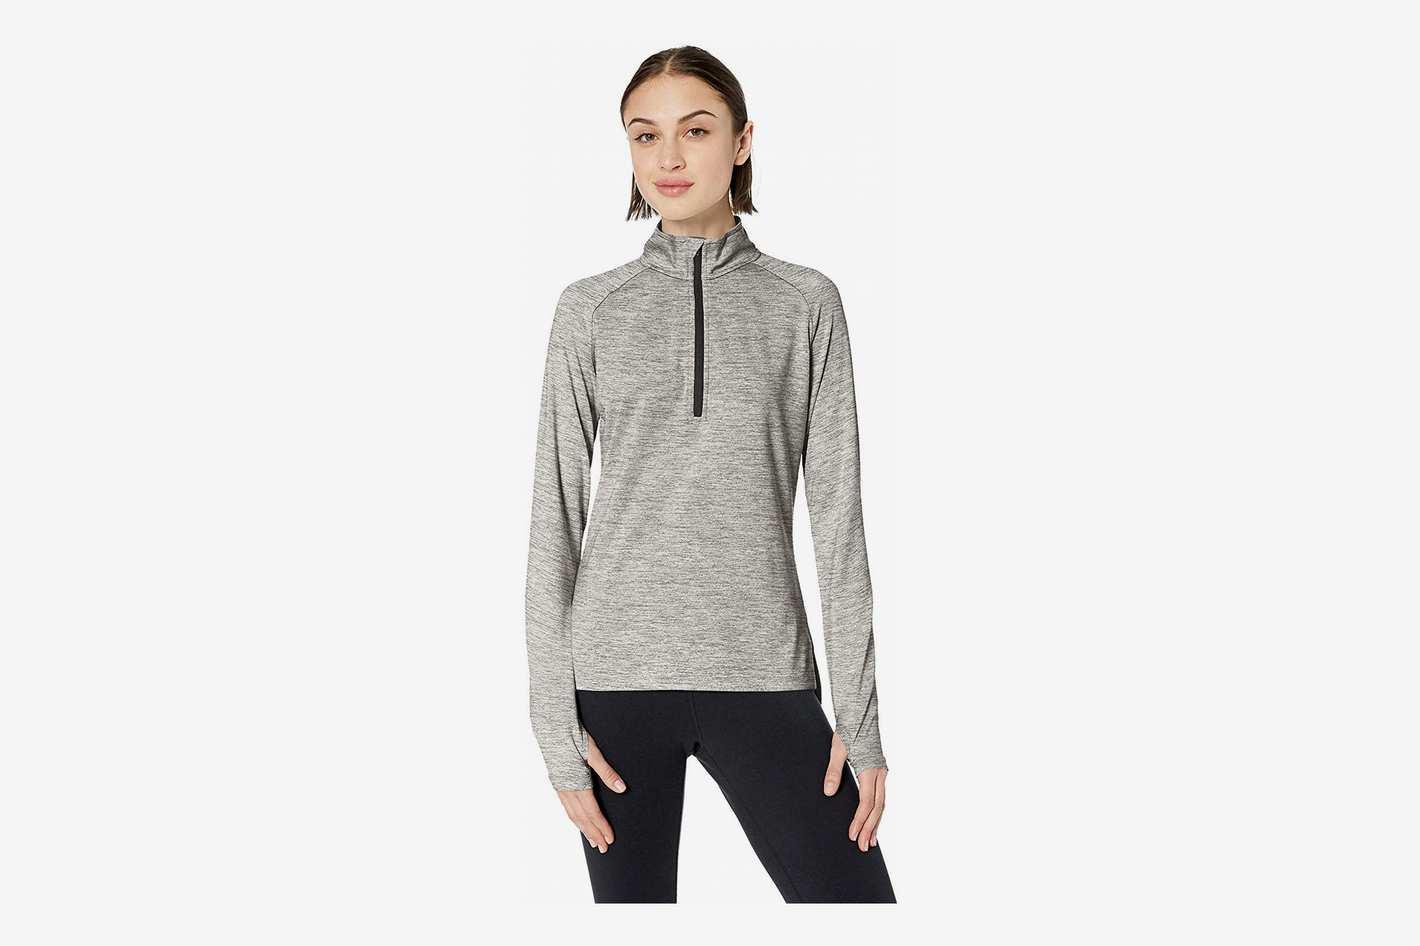 73e6f01d5deb Amazon Brand Core 10 Women's Soft Tech Workout Half-Zip Long Sleeve Top